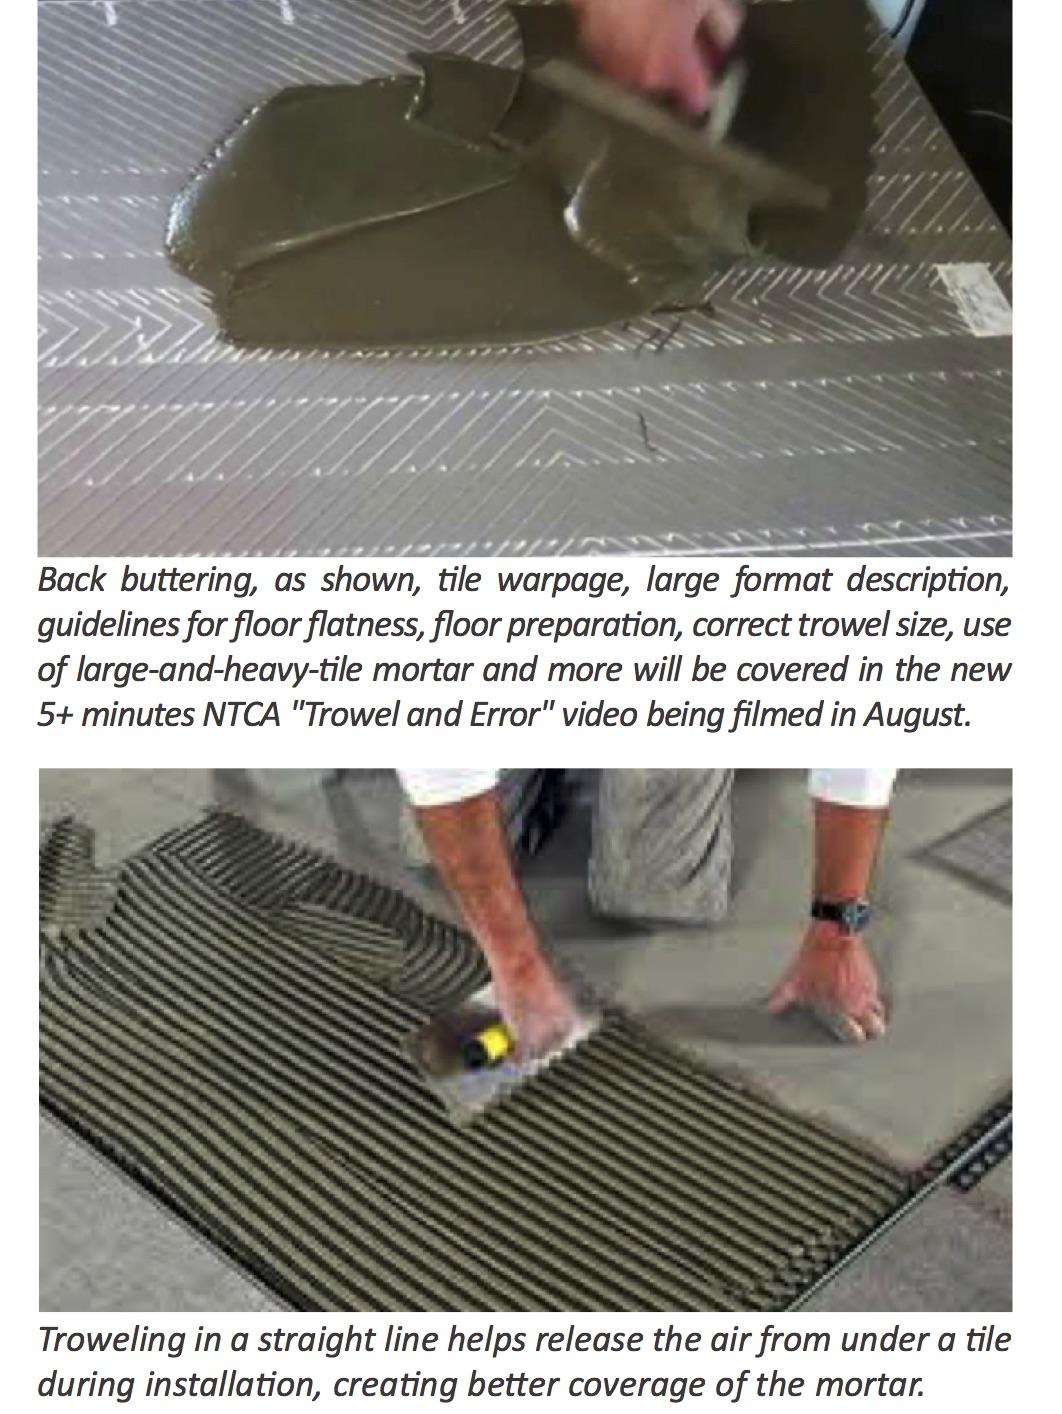 Trowel Notch Size For Large Tiles : Trowel size for porcelain floor tile carpet vidalondon